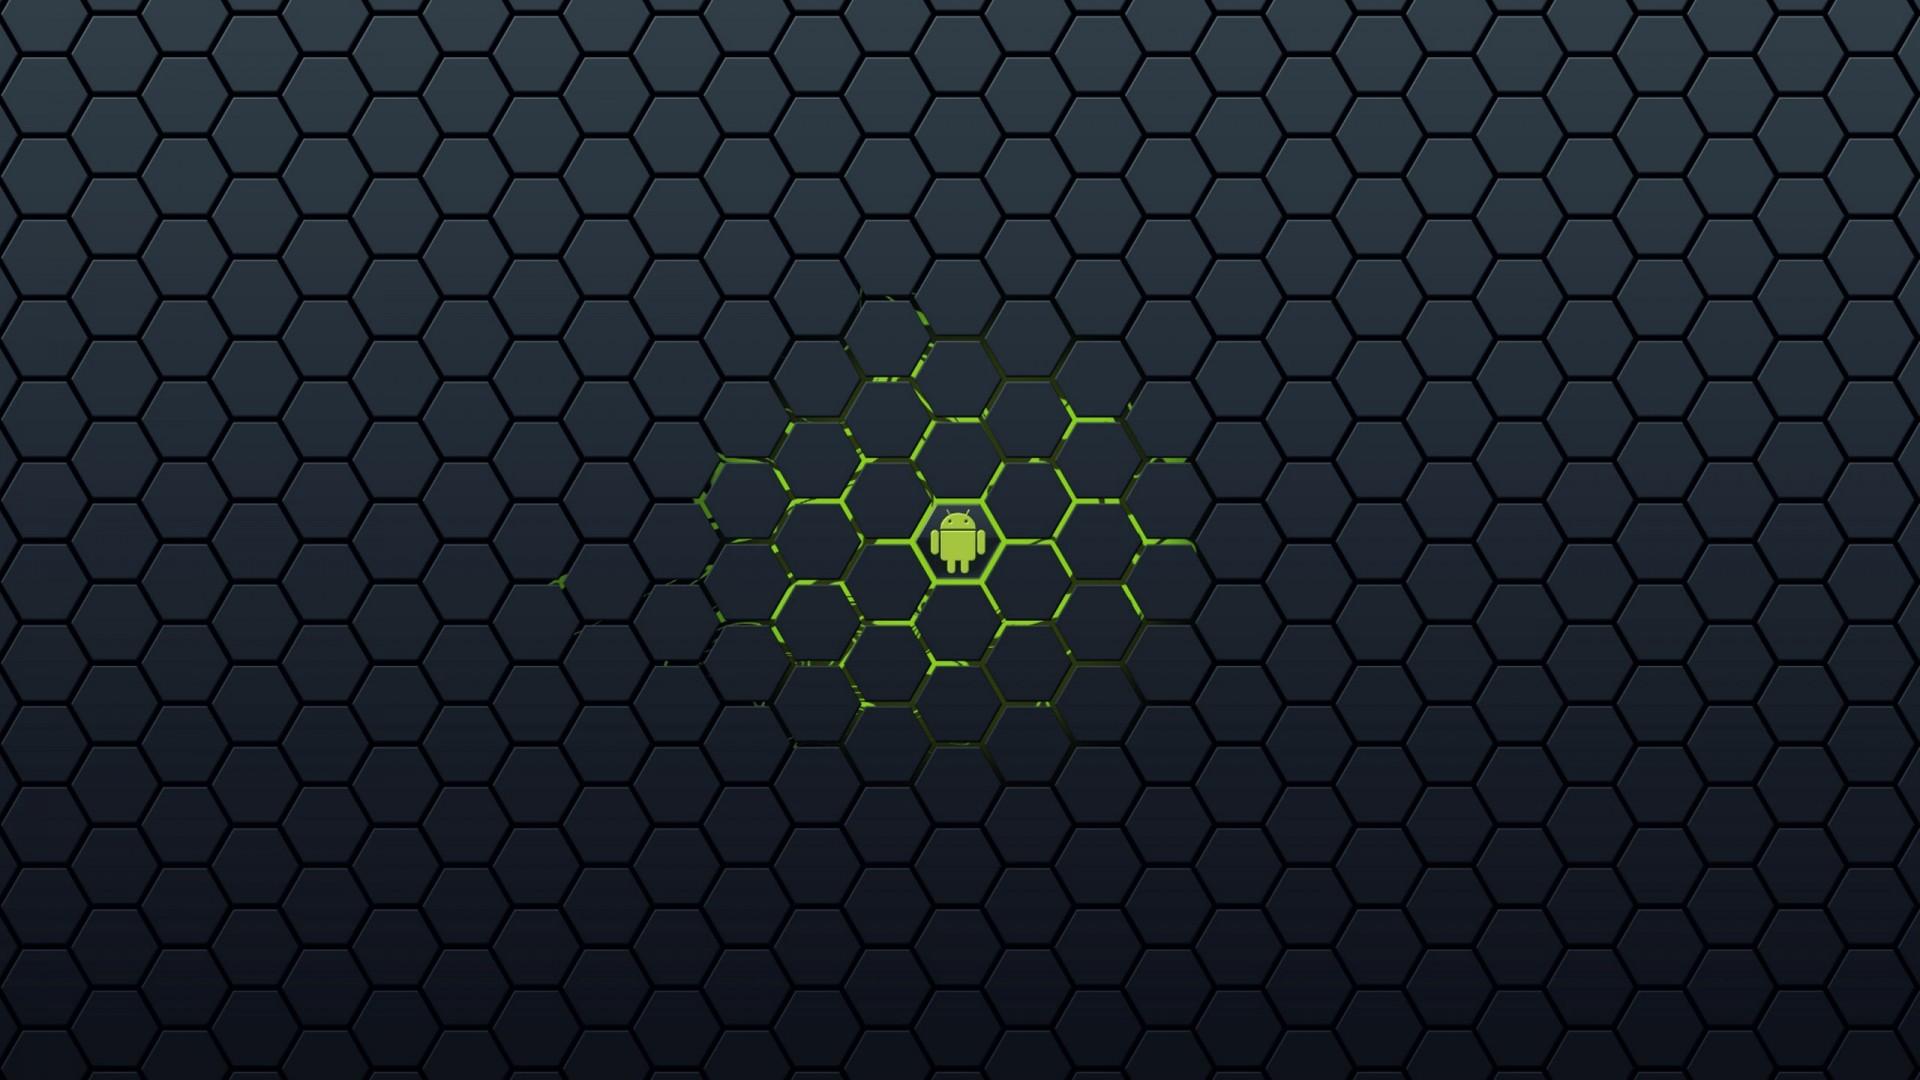 Android Wallpaper Resolution Wallpapertag